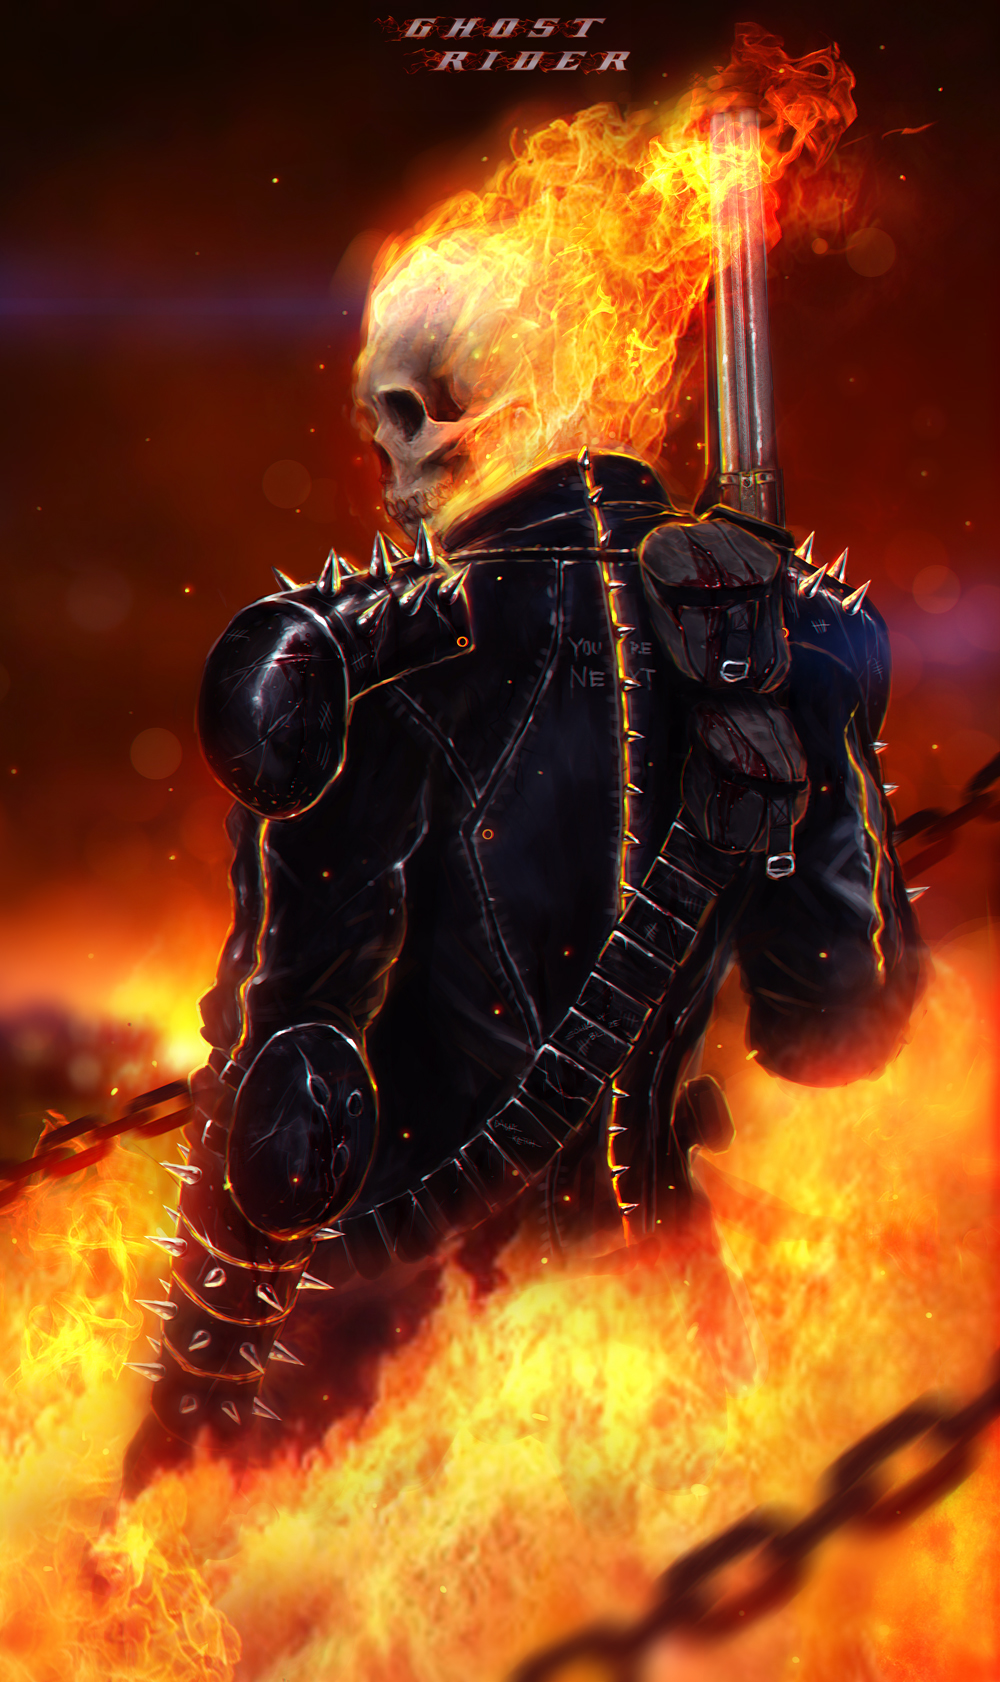 Ghost Rider Character Image 2317243 Zerochan Anime Image Board